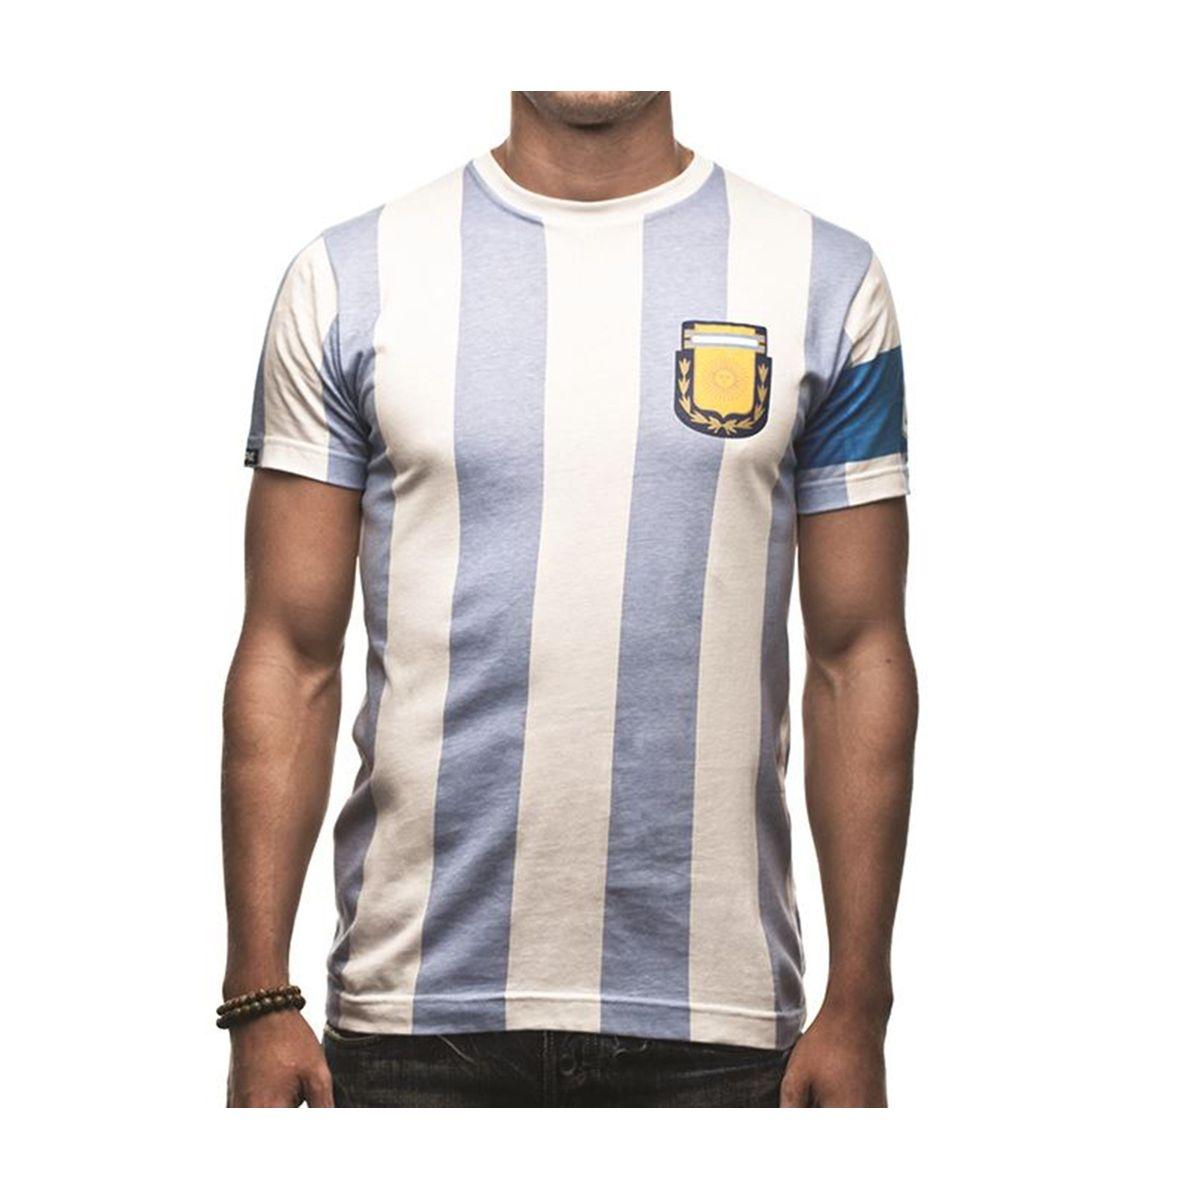 T-SHIRT ARGENTINE CAPITANO 10